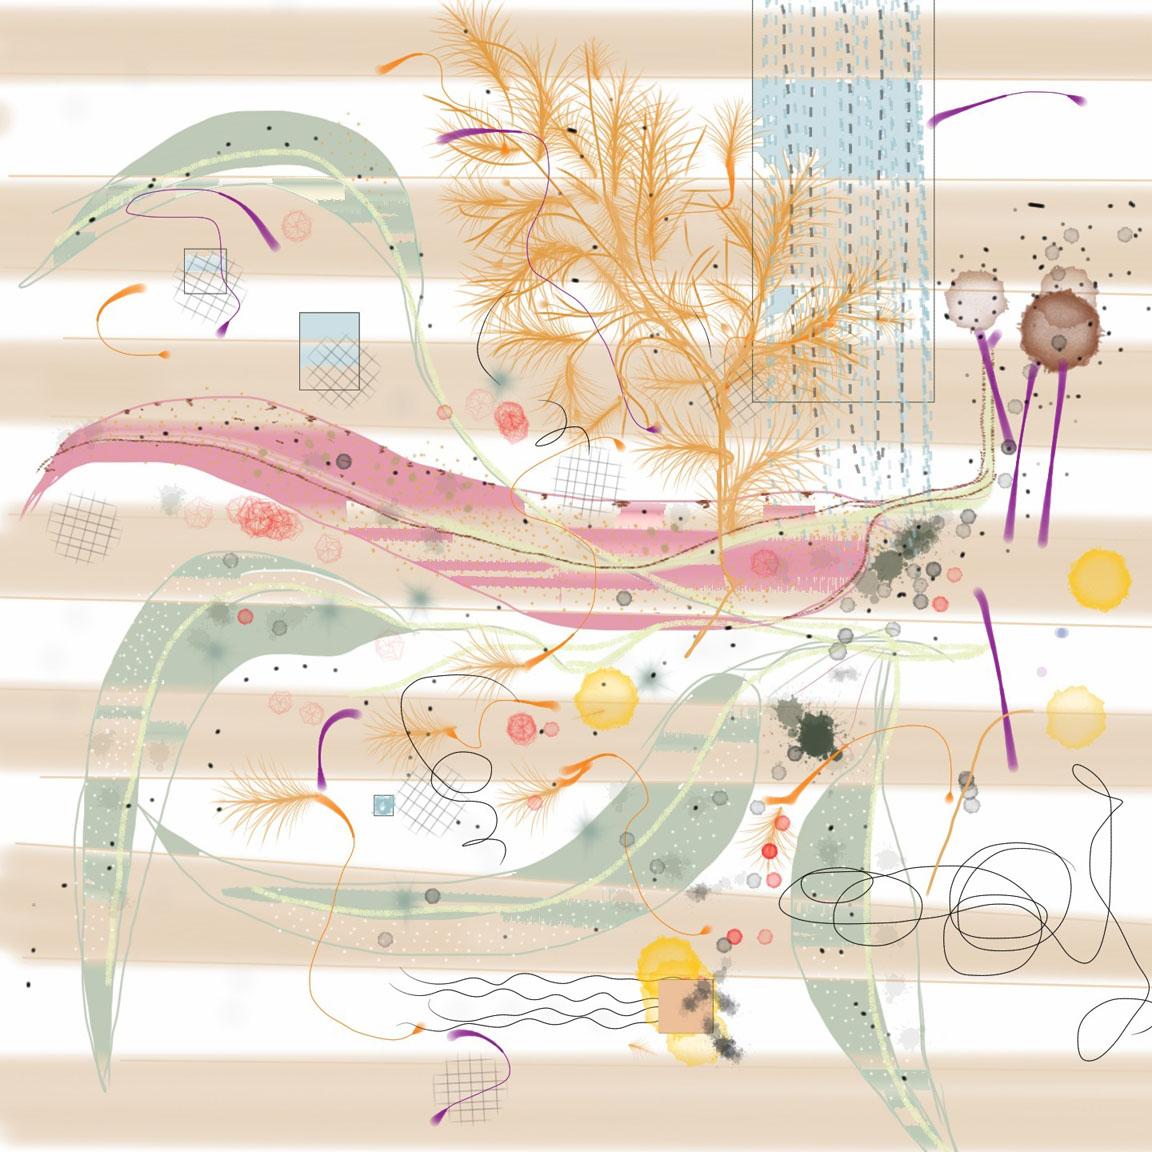 Candace Loheed, Curvasive, 16 x 16 giclee